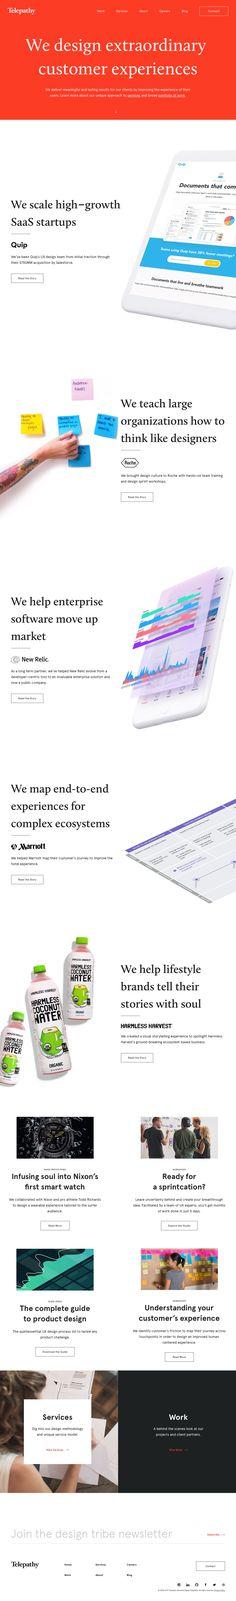 Telepathy - Customer Experience & UX Design Agency